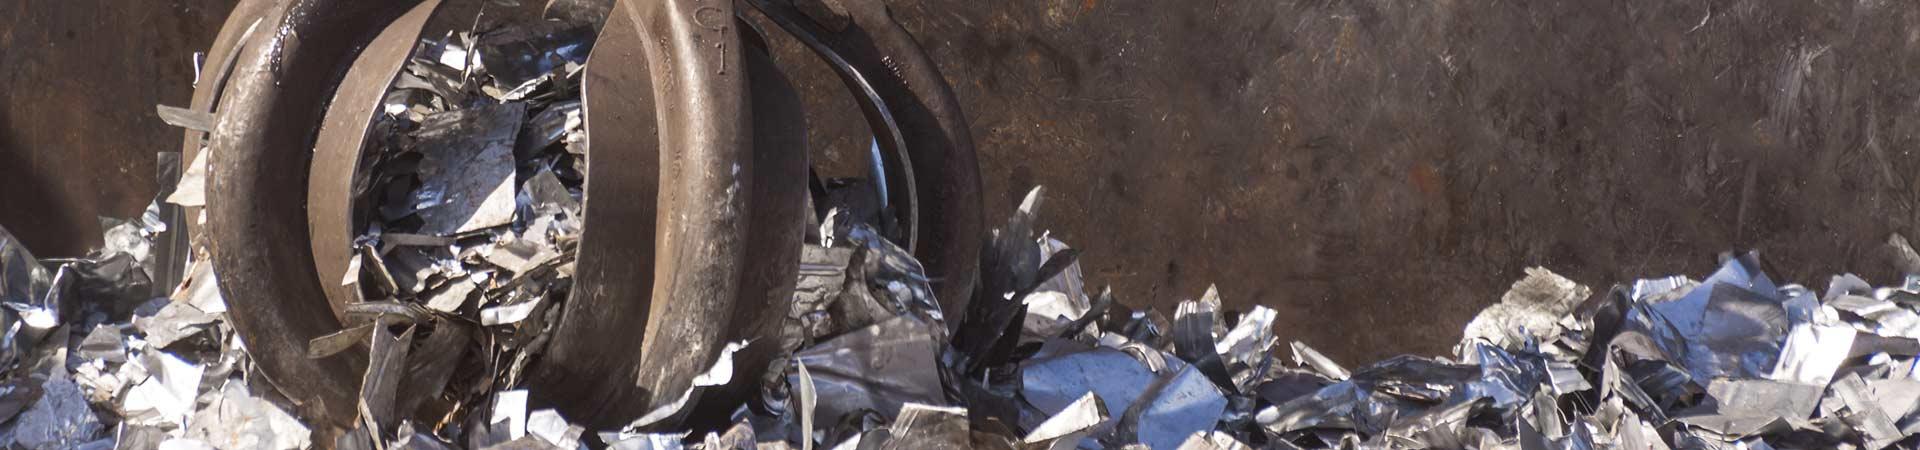 sydney copper recycling recycle crane metals